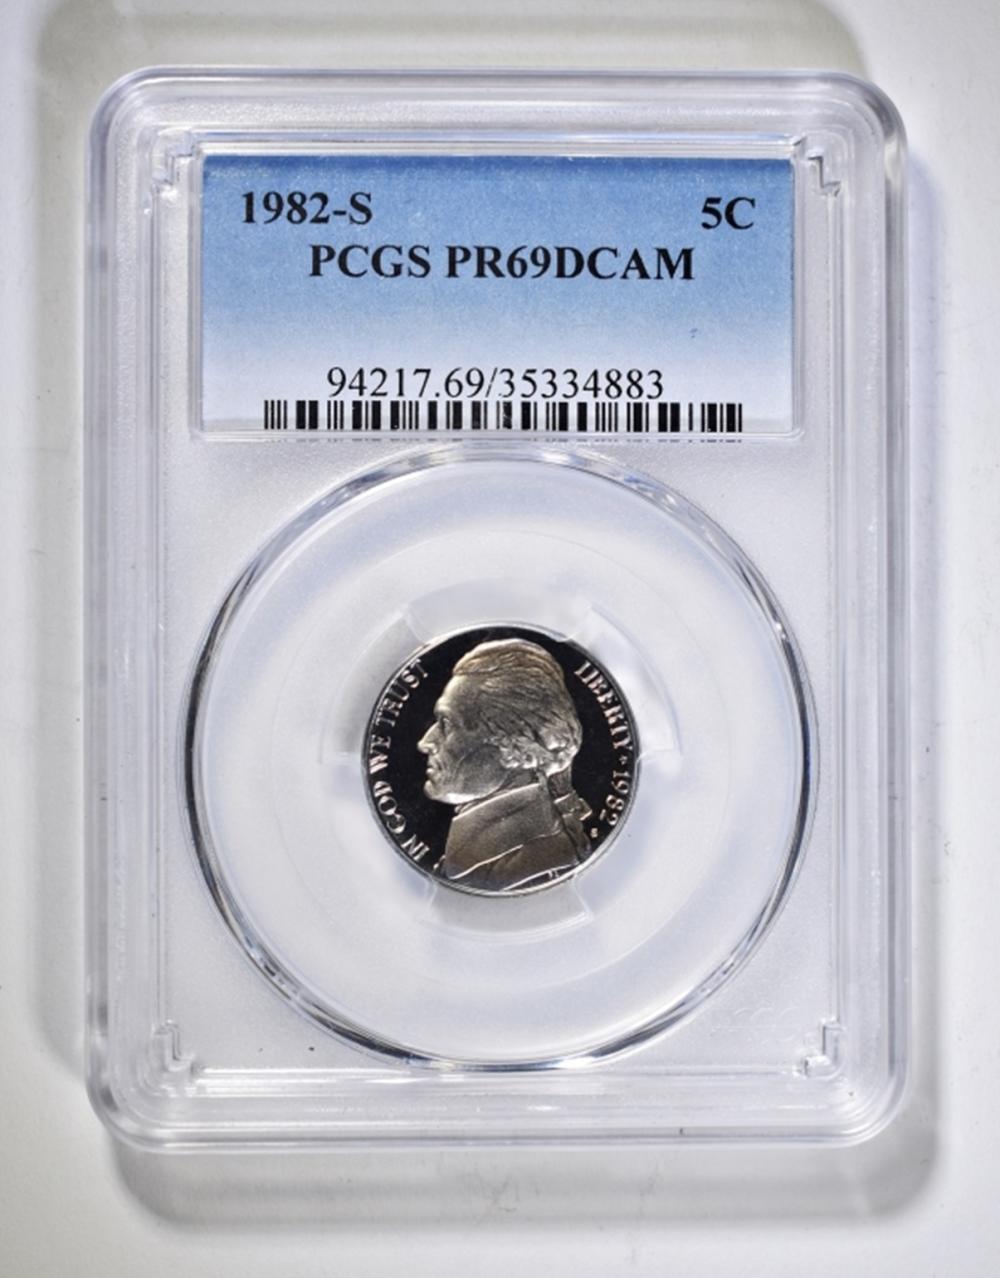 1982-S JEFFERSON NICKEL PCGS PR-69 DCAM